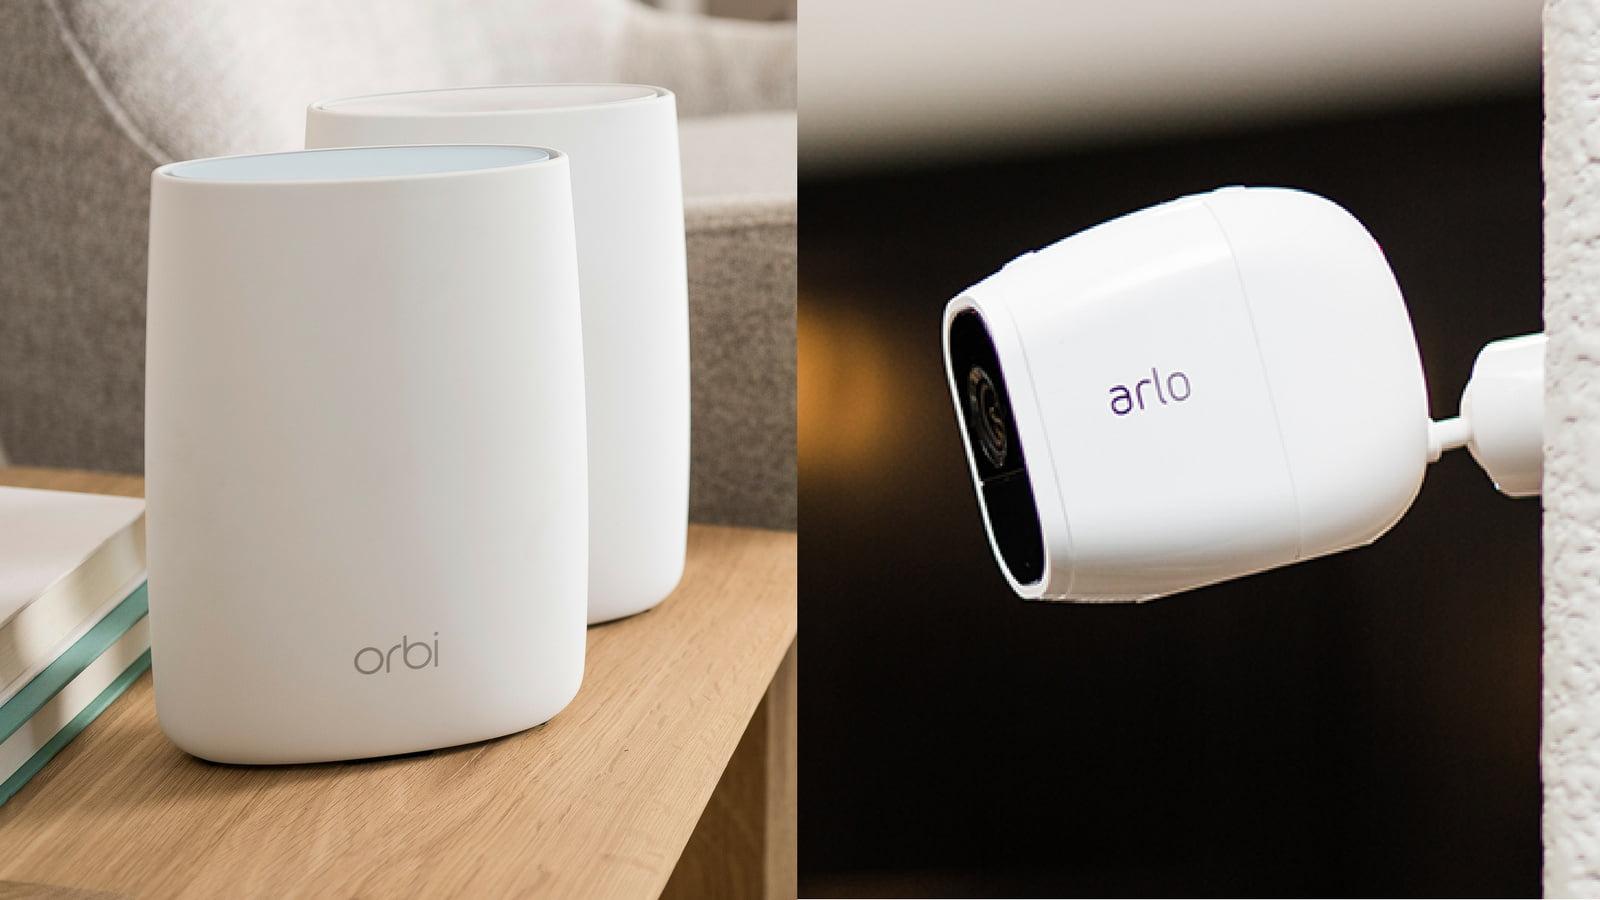 netgear-store-orbi-mesh-wifi-arlo-pro-2-ip-cam-套裝-組合-春節-新春-減價-折扣-優惠